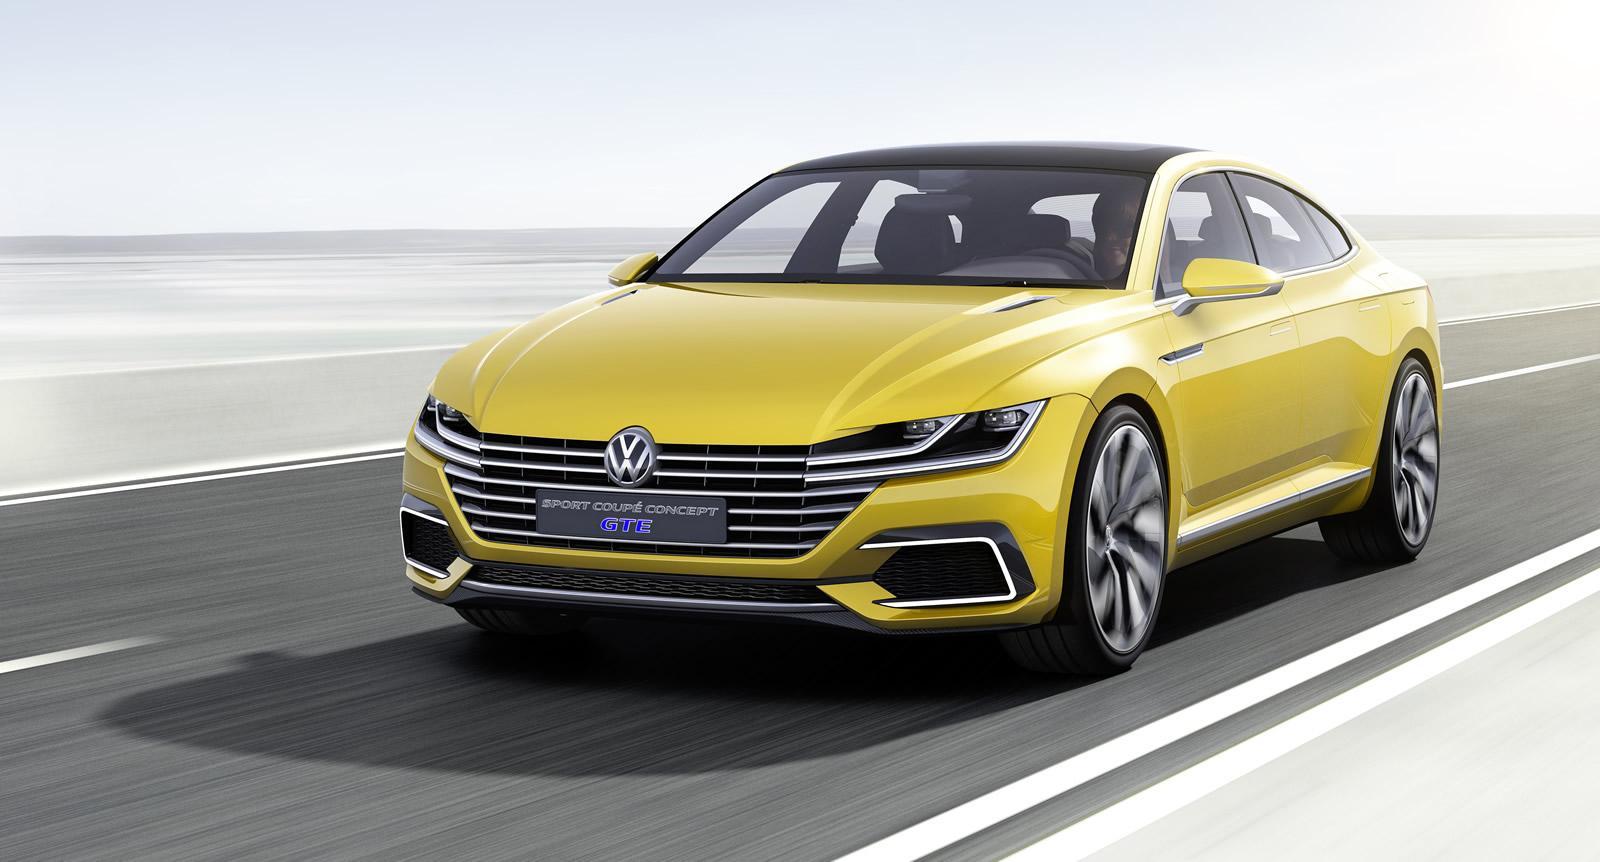 Volkswagen sport coupe concept gte: обзор,характеристики,комплектация,цена,фото,видео.